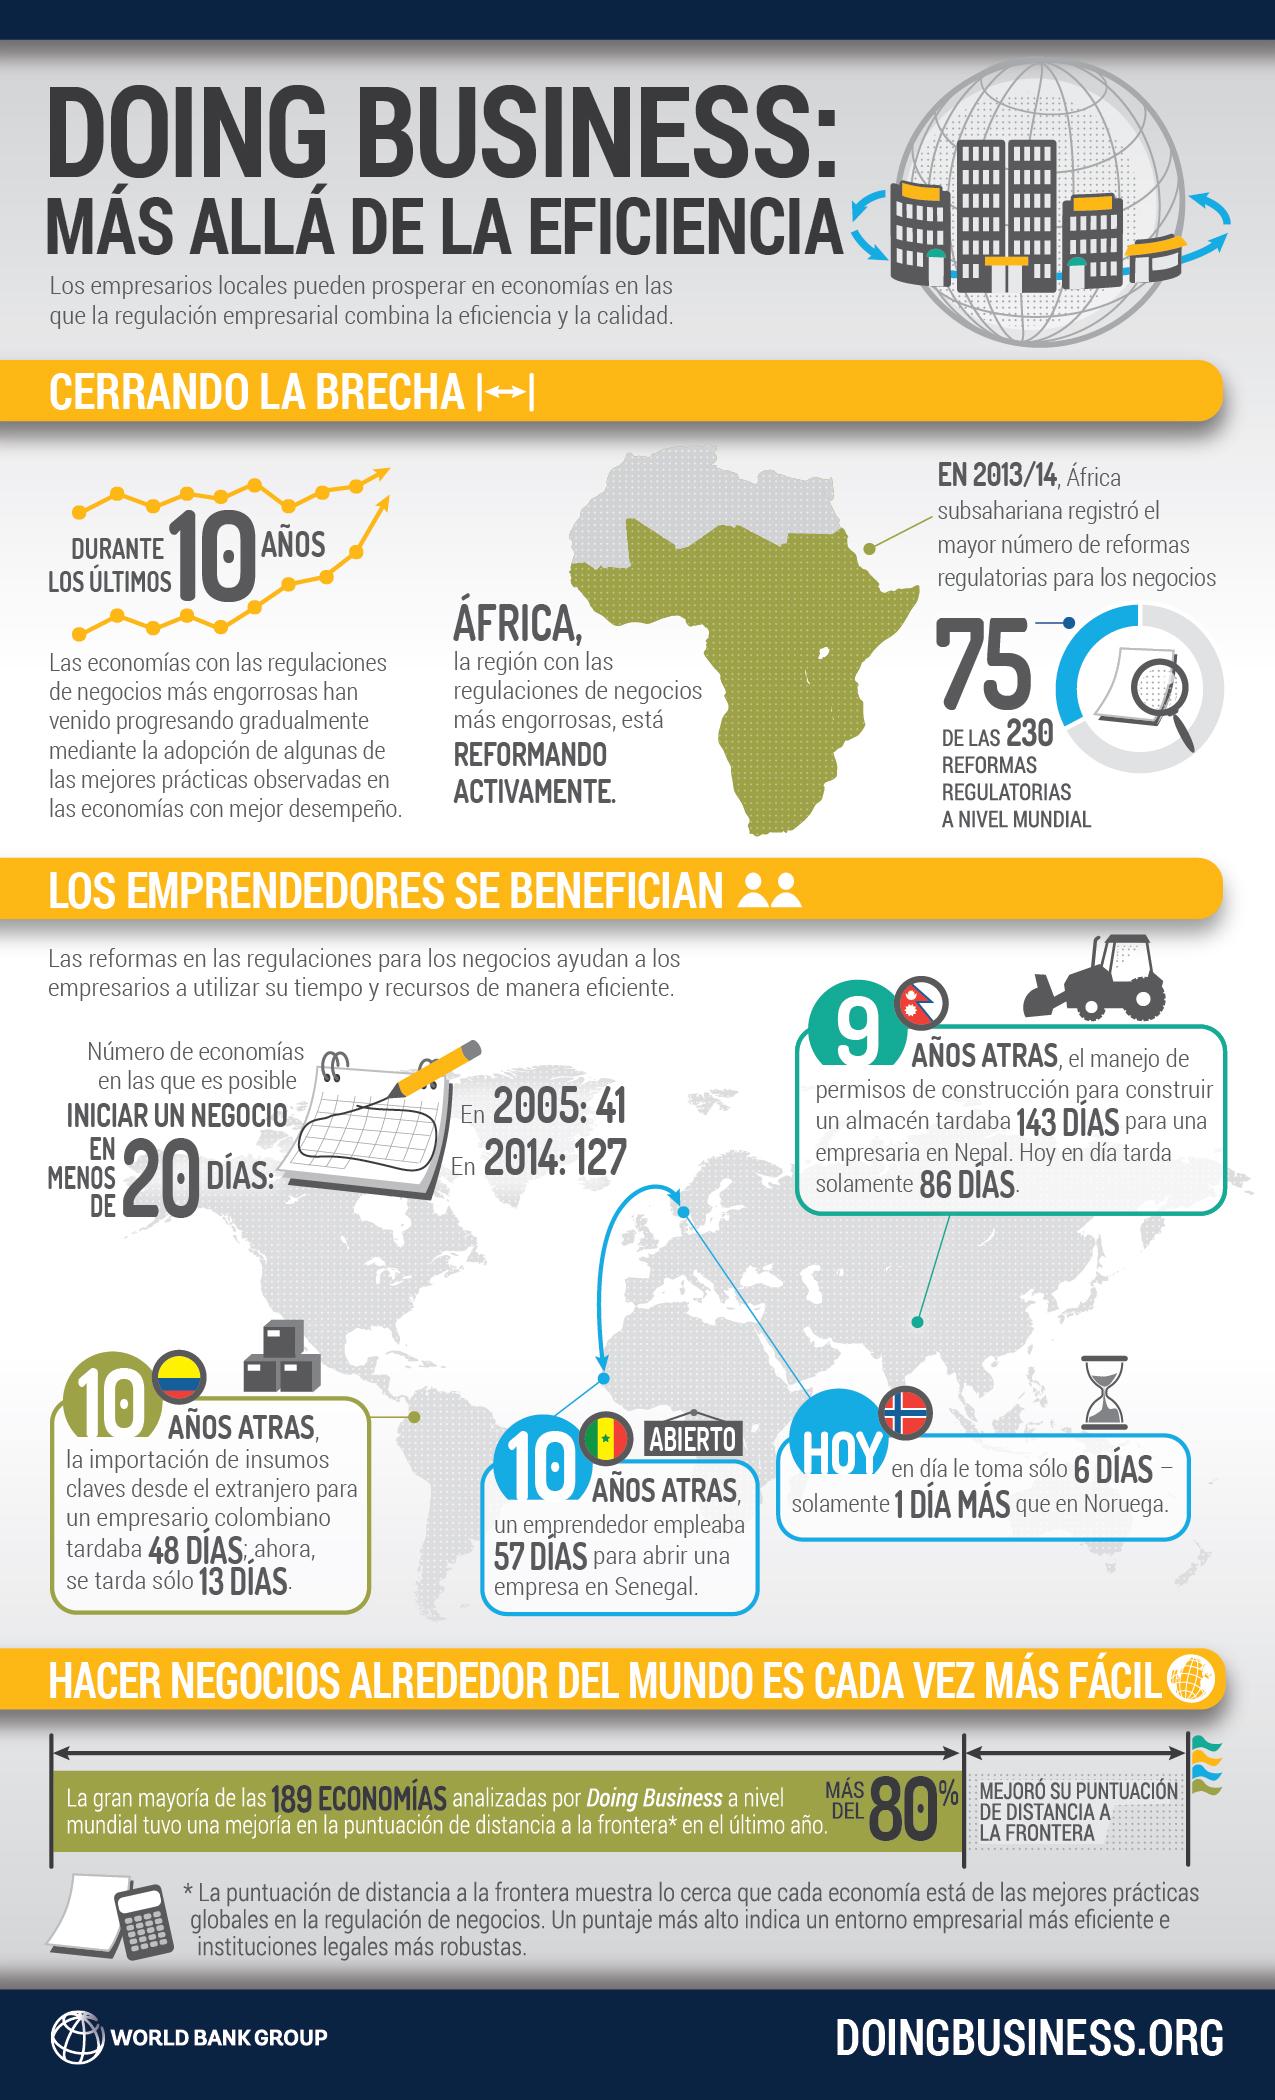 https://i0.wp.com/www.worldbank.org/content/dam/Worldbank/doing-business-fy14-spanish.jpg